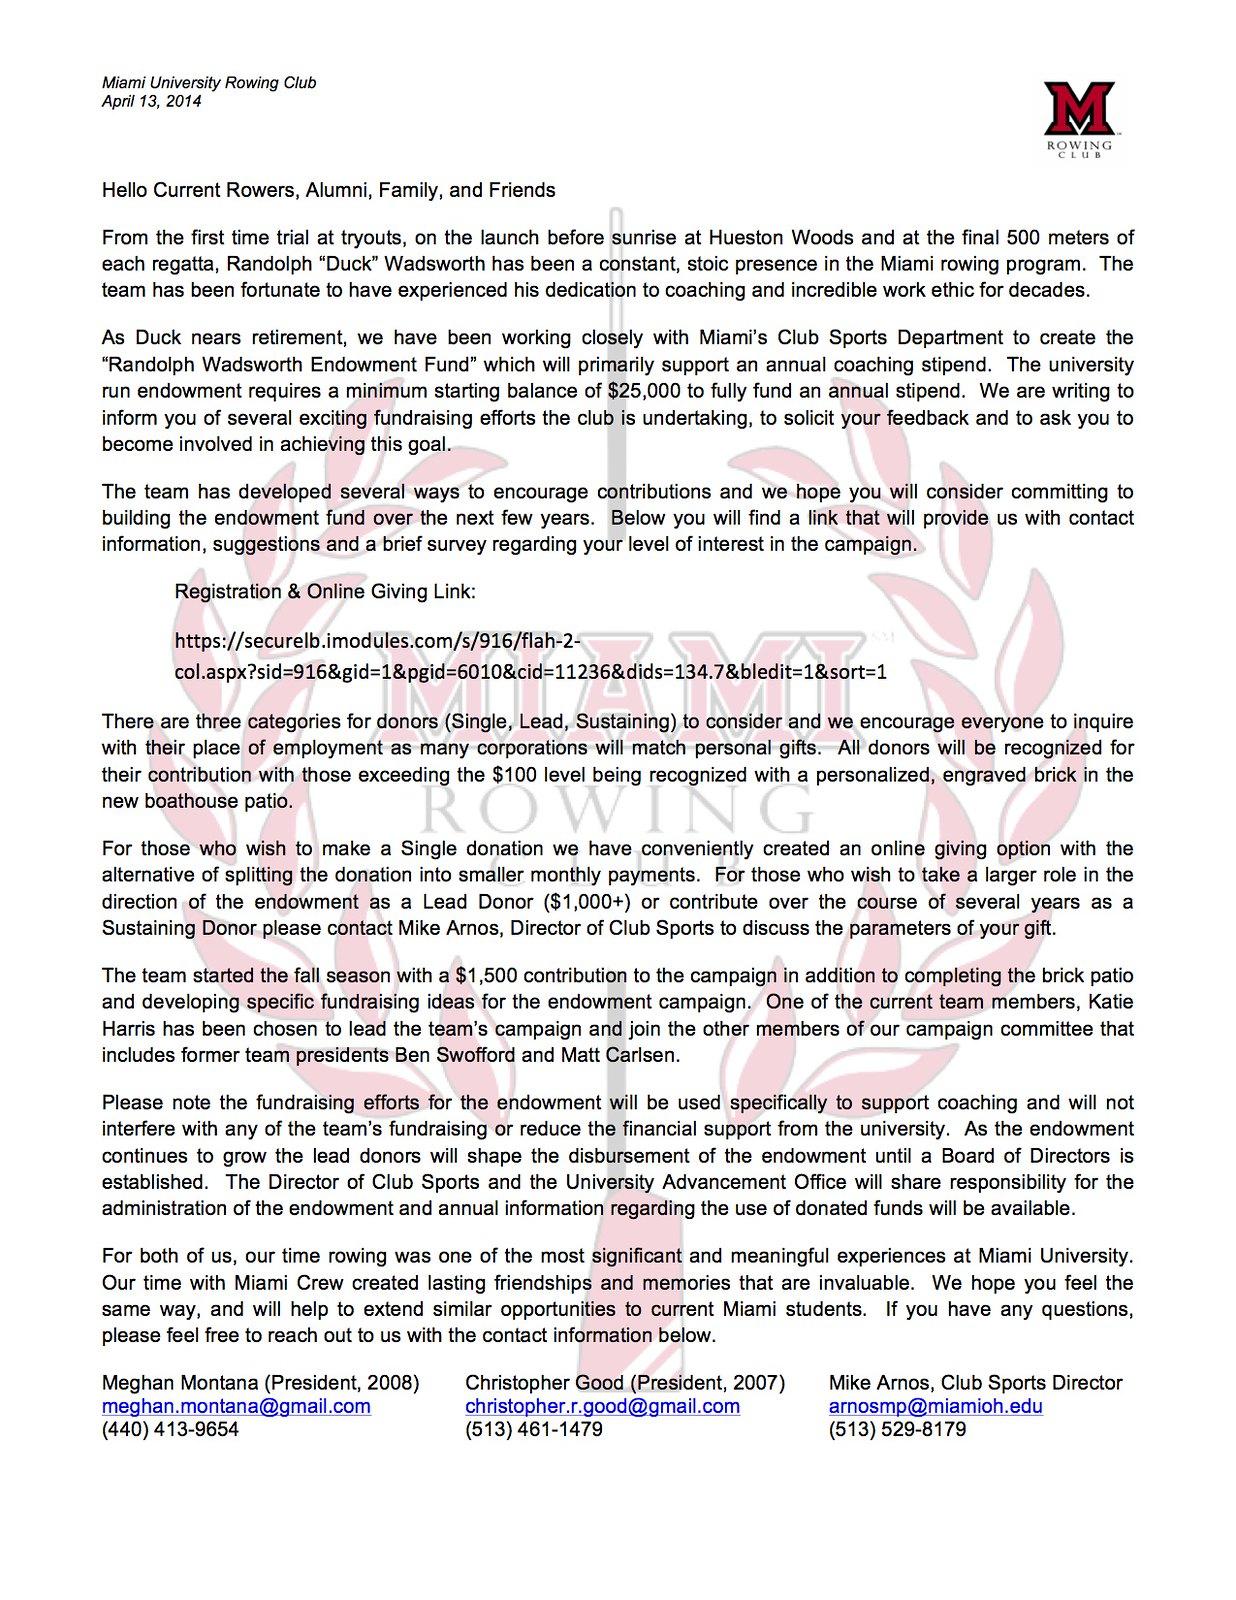 Endowment Letter